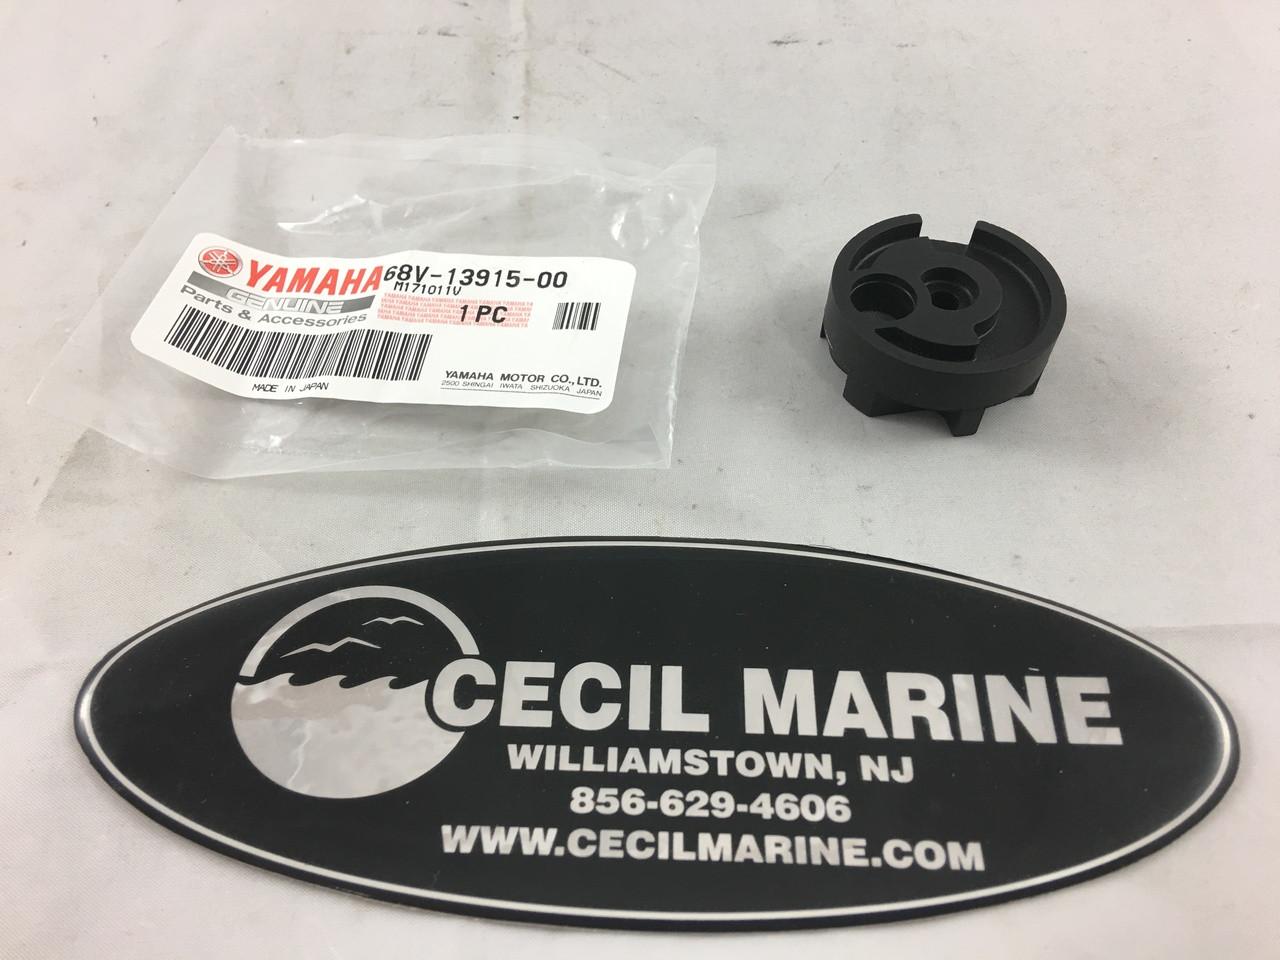 medium resolution of  39 45 yamaha fuel filter 68v 13915 00 in stock ready to ship cecil marine